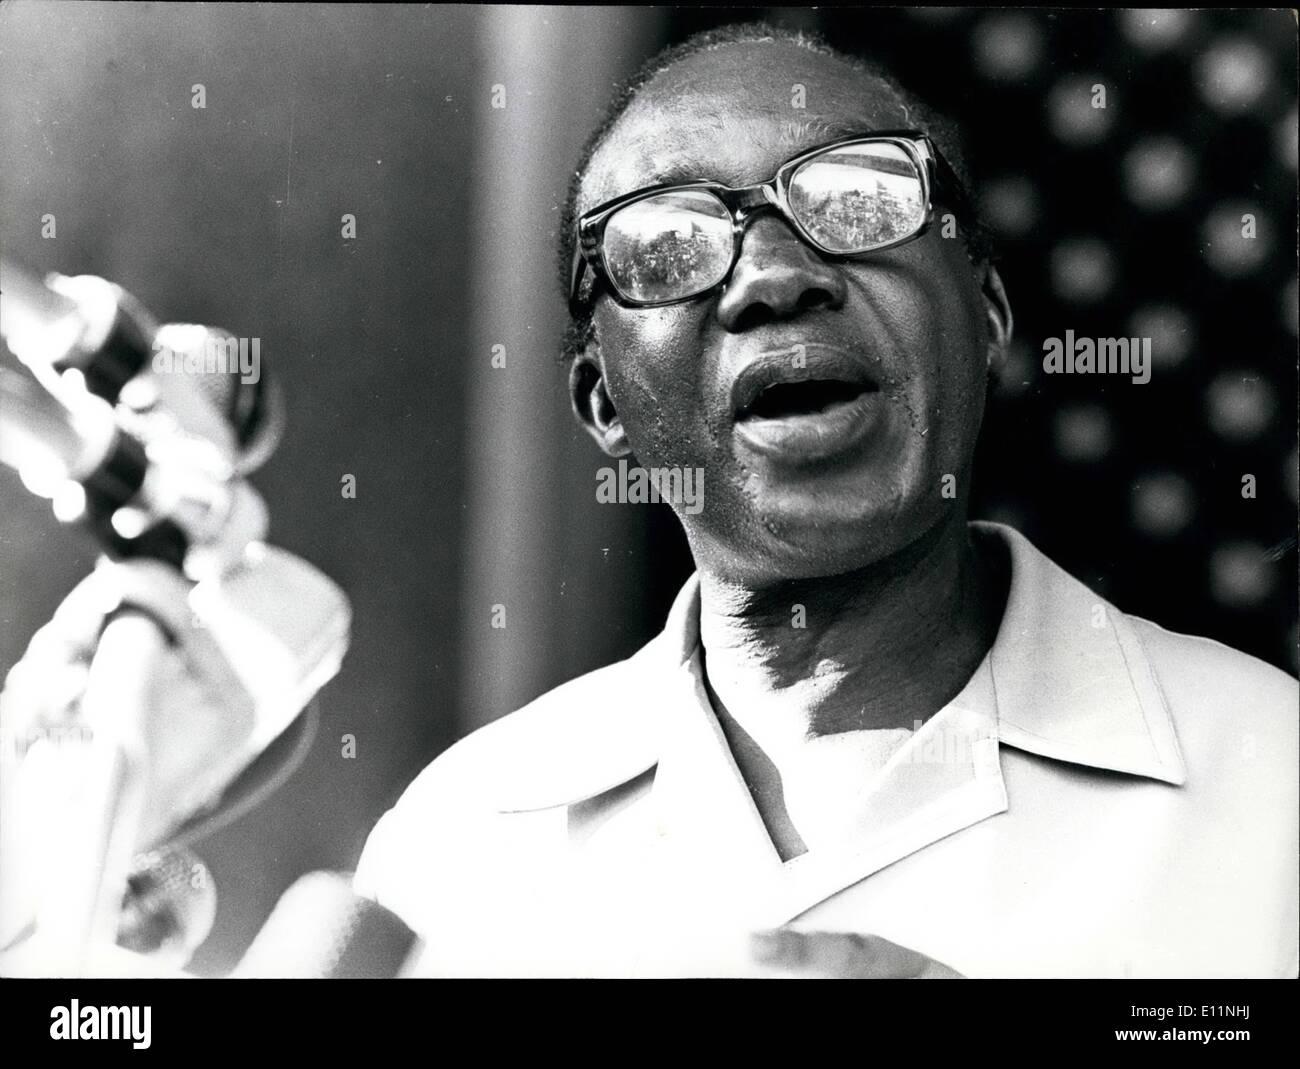 Apr. 04, 1979 - Lule Uganda: Yusuf Lule, The New President of Uganda. He is addressing here at Parliament buiildings after being sworn-in as Head of State. Credits: Camerapix - Stock Image